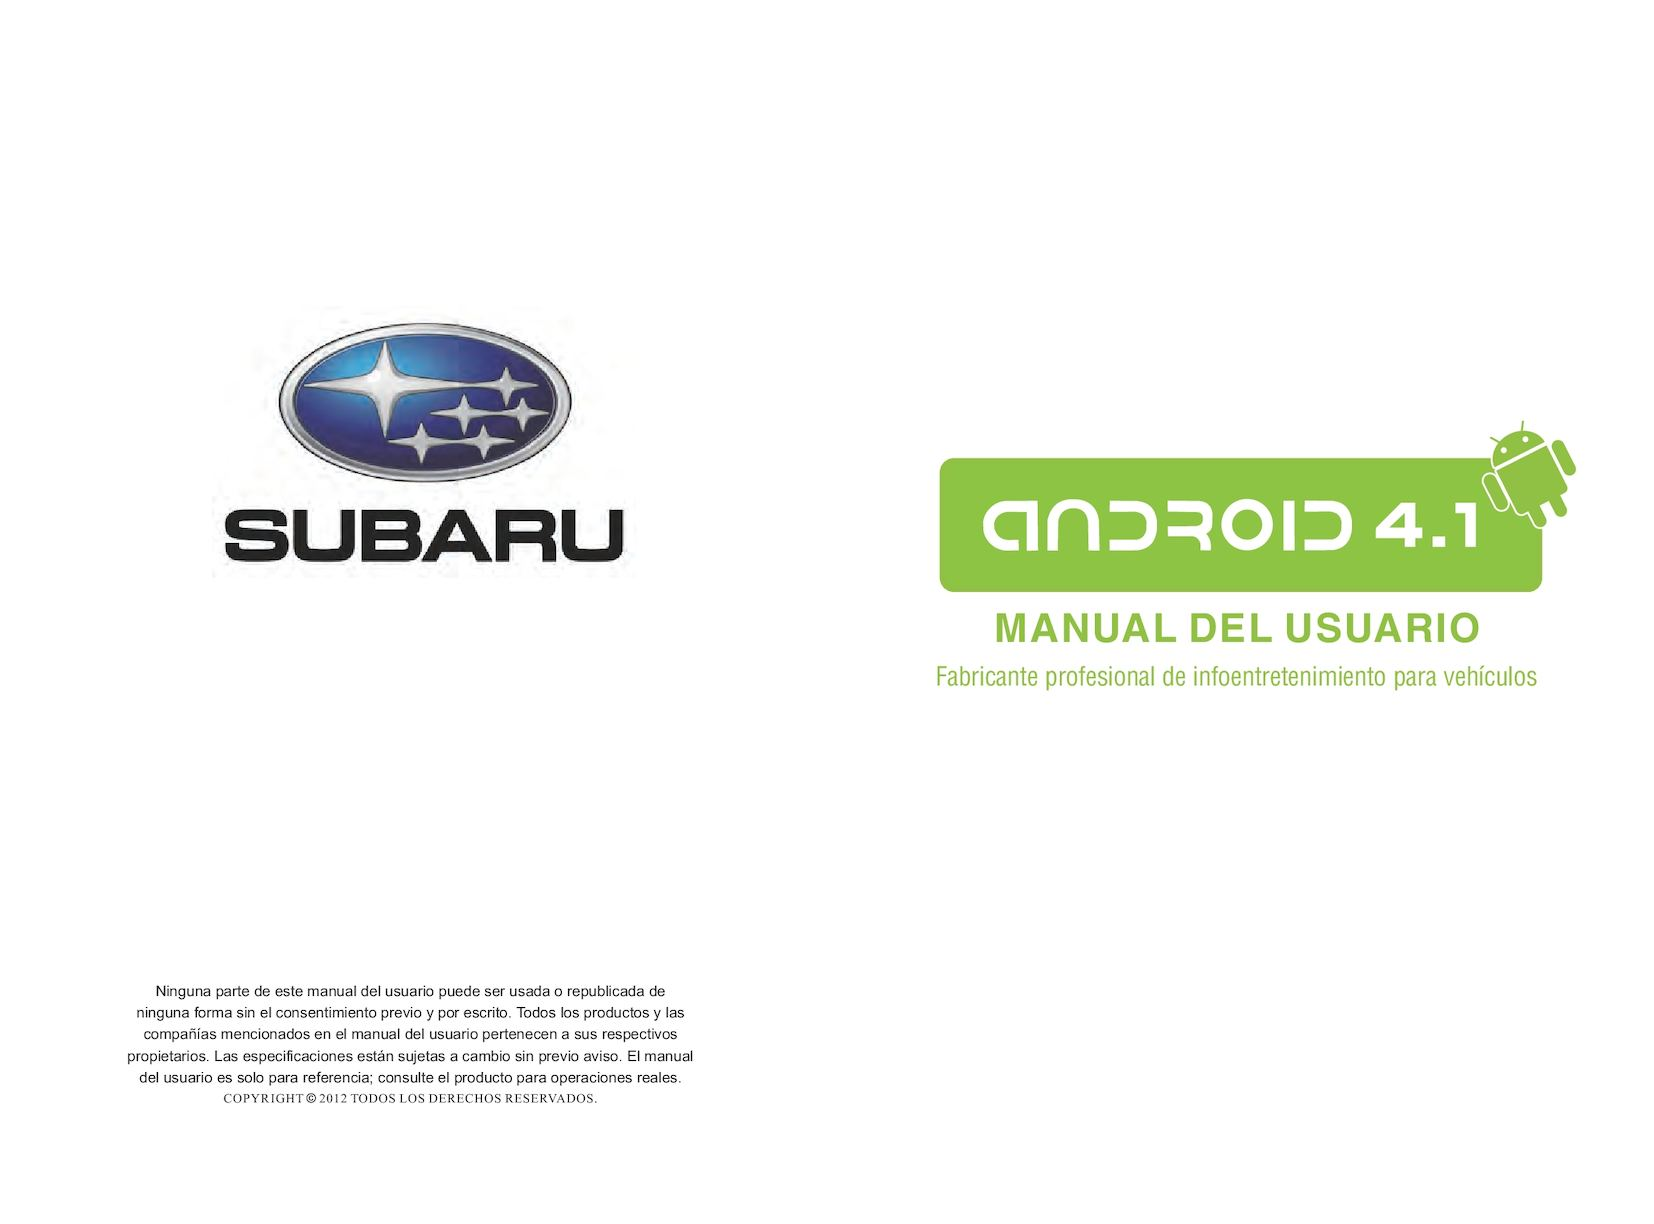 Calaméo - Subaru Android 4 1 Spanish